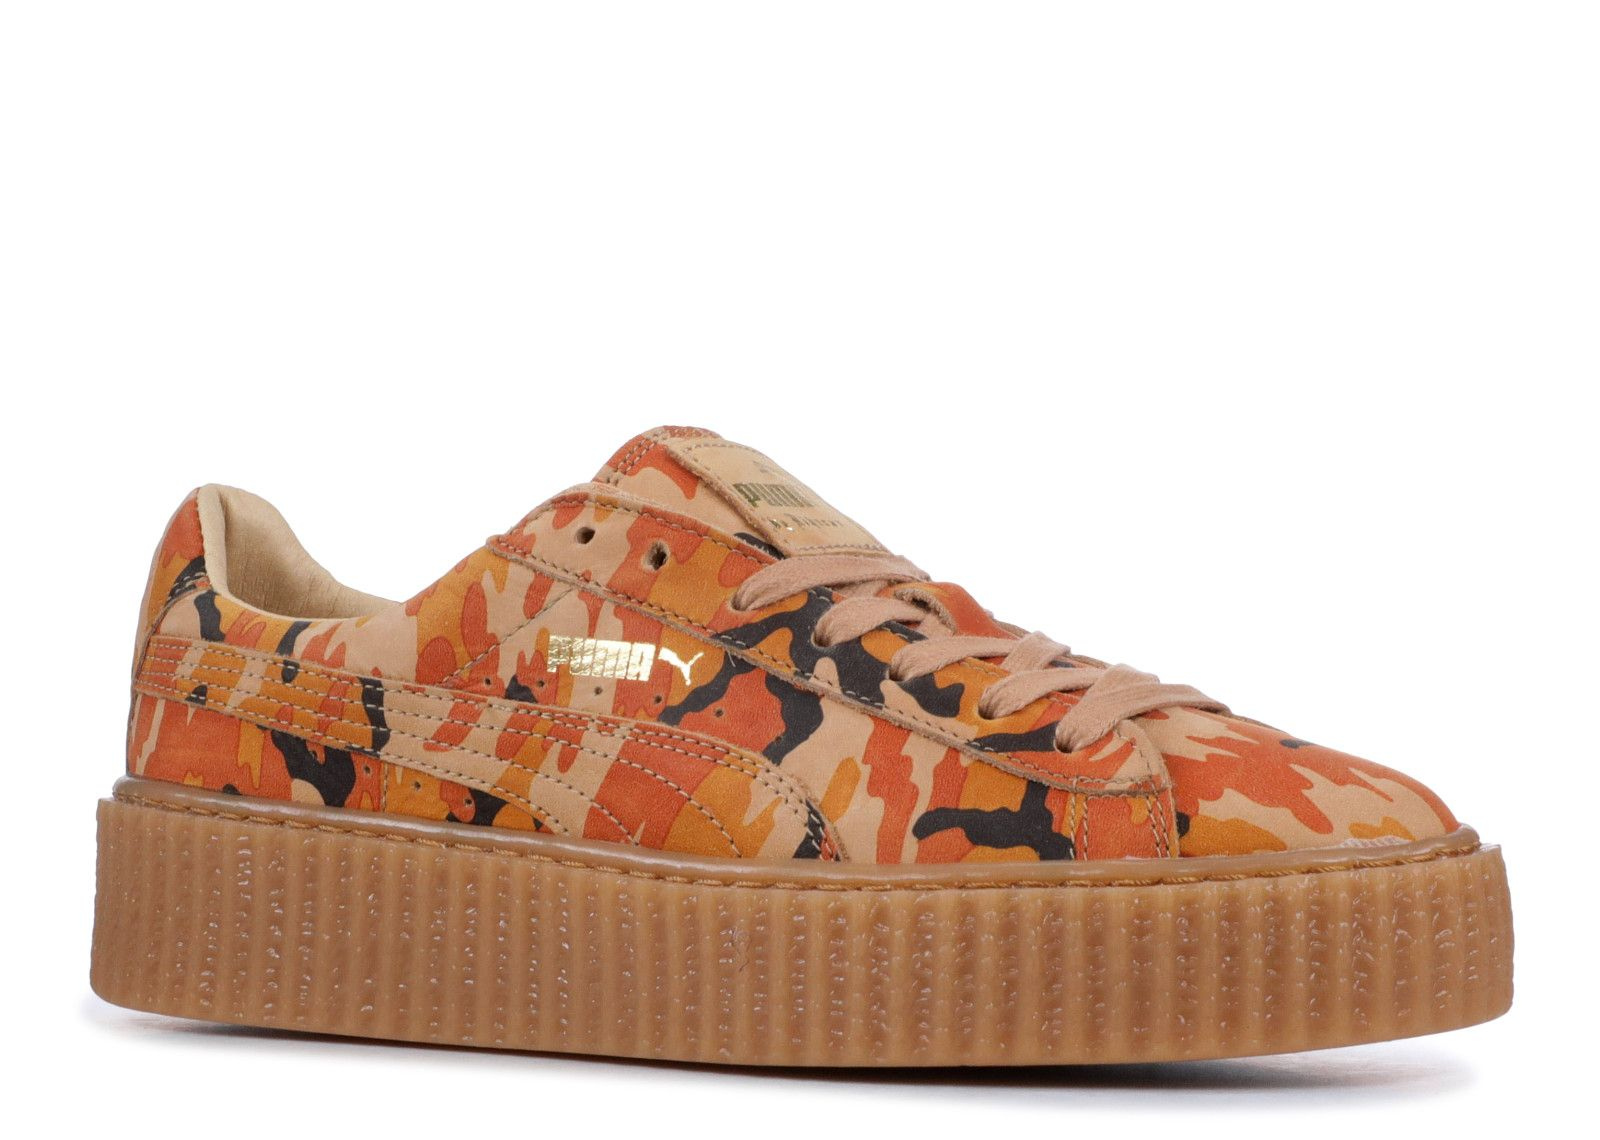 Puma x Rihanna Suede Creepers Camo Orange Orange Oatmeal